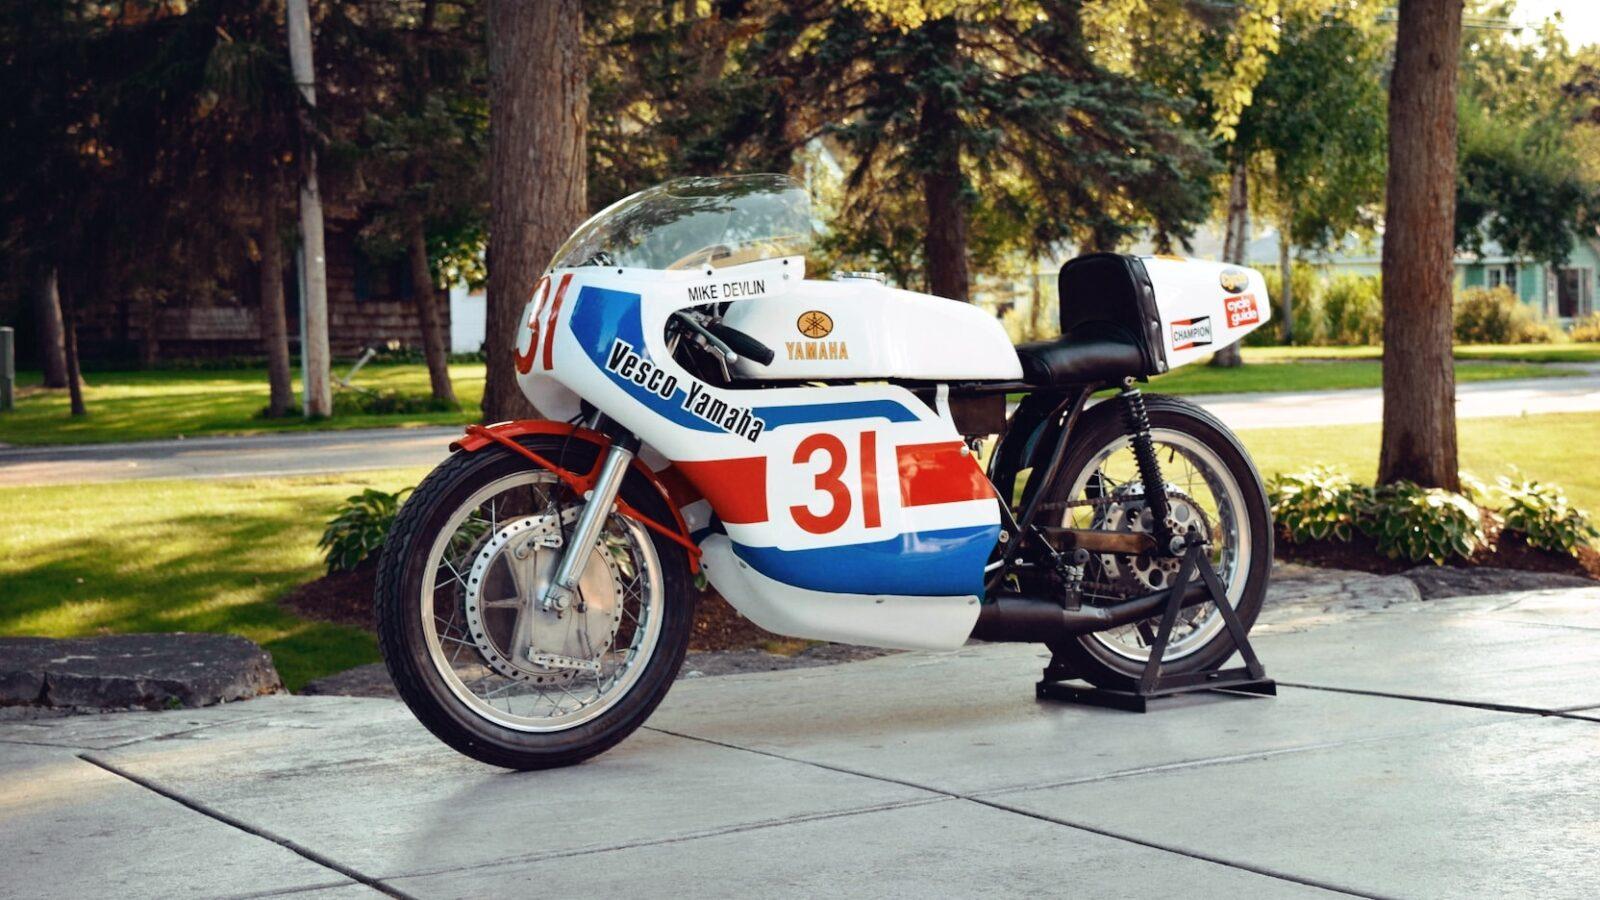 Yamaha TD3 Mike Devlin 3 1600x900 - 1972 Yamaha TD3 Mike Devlin